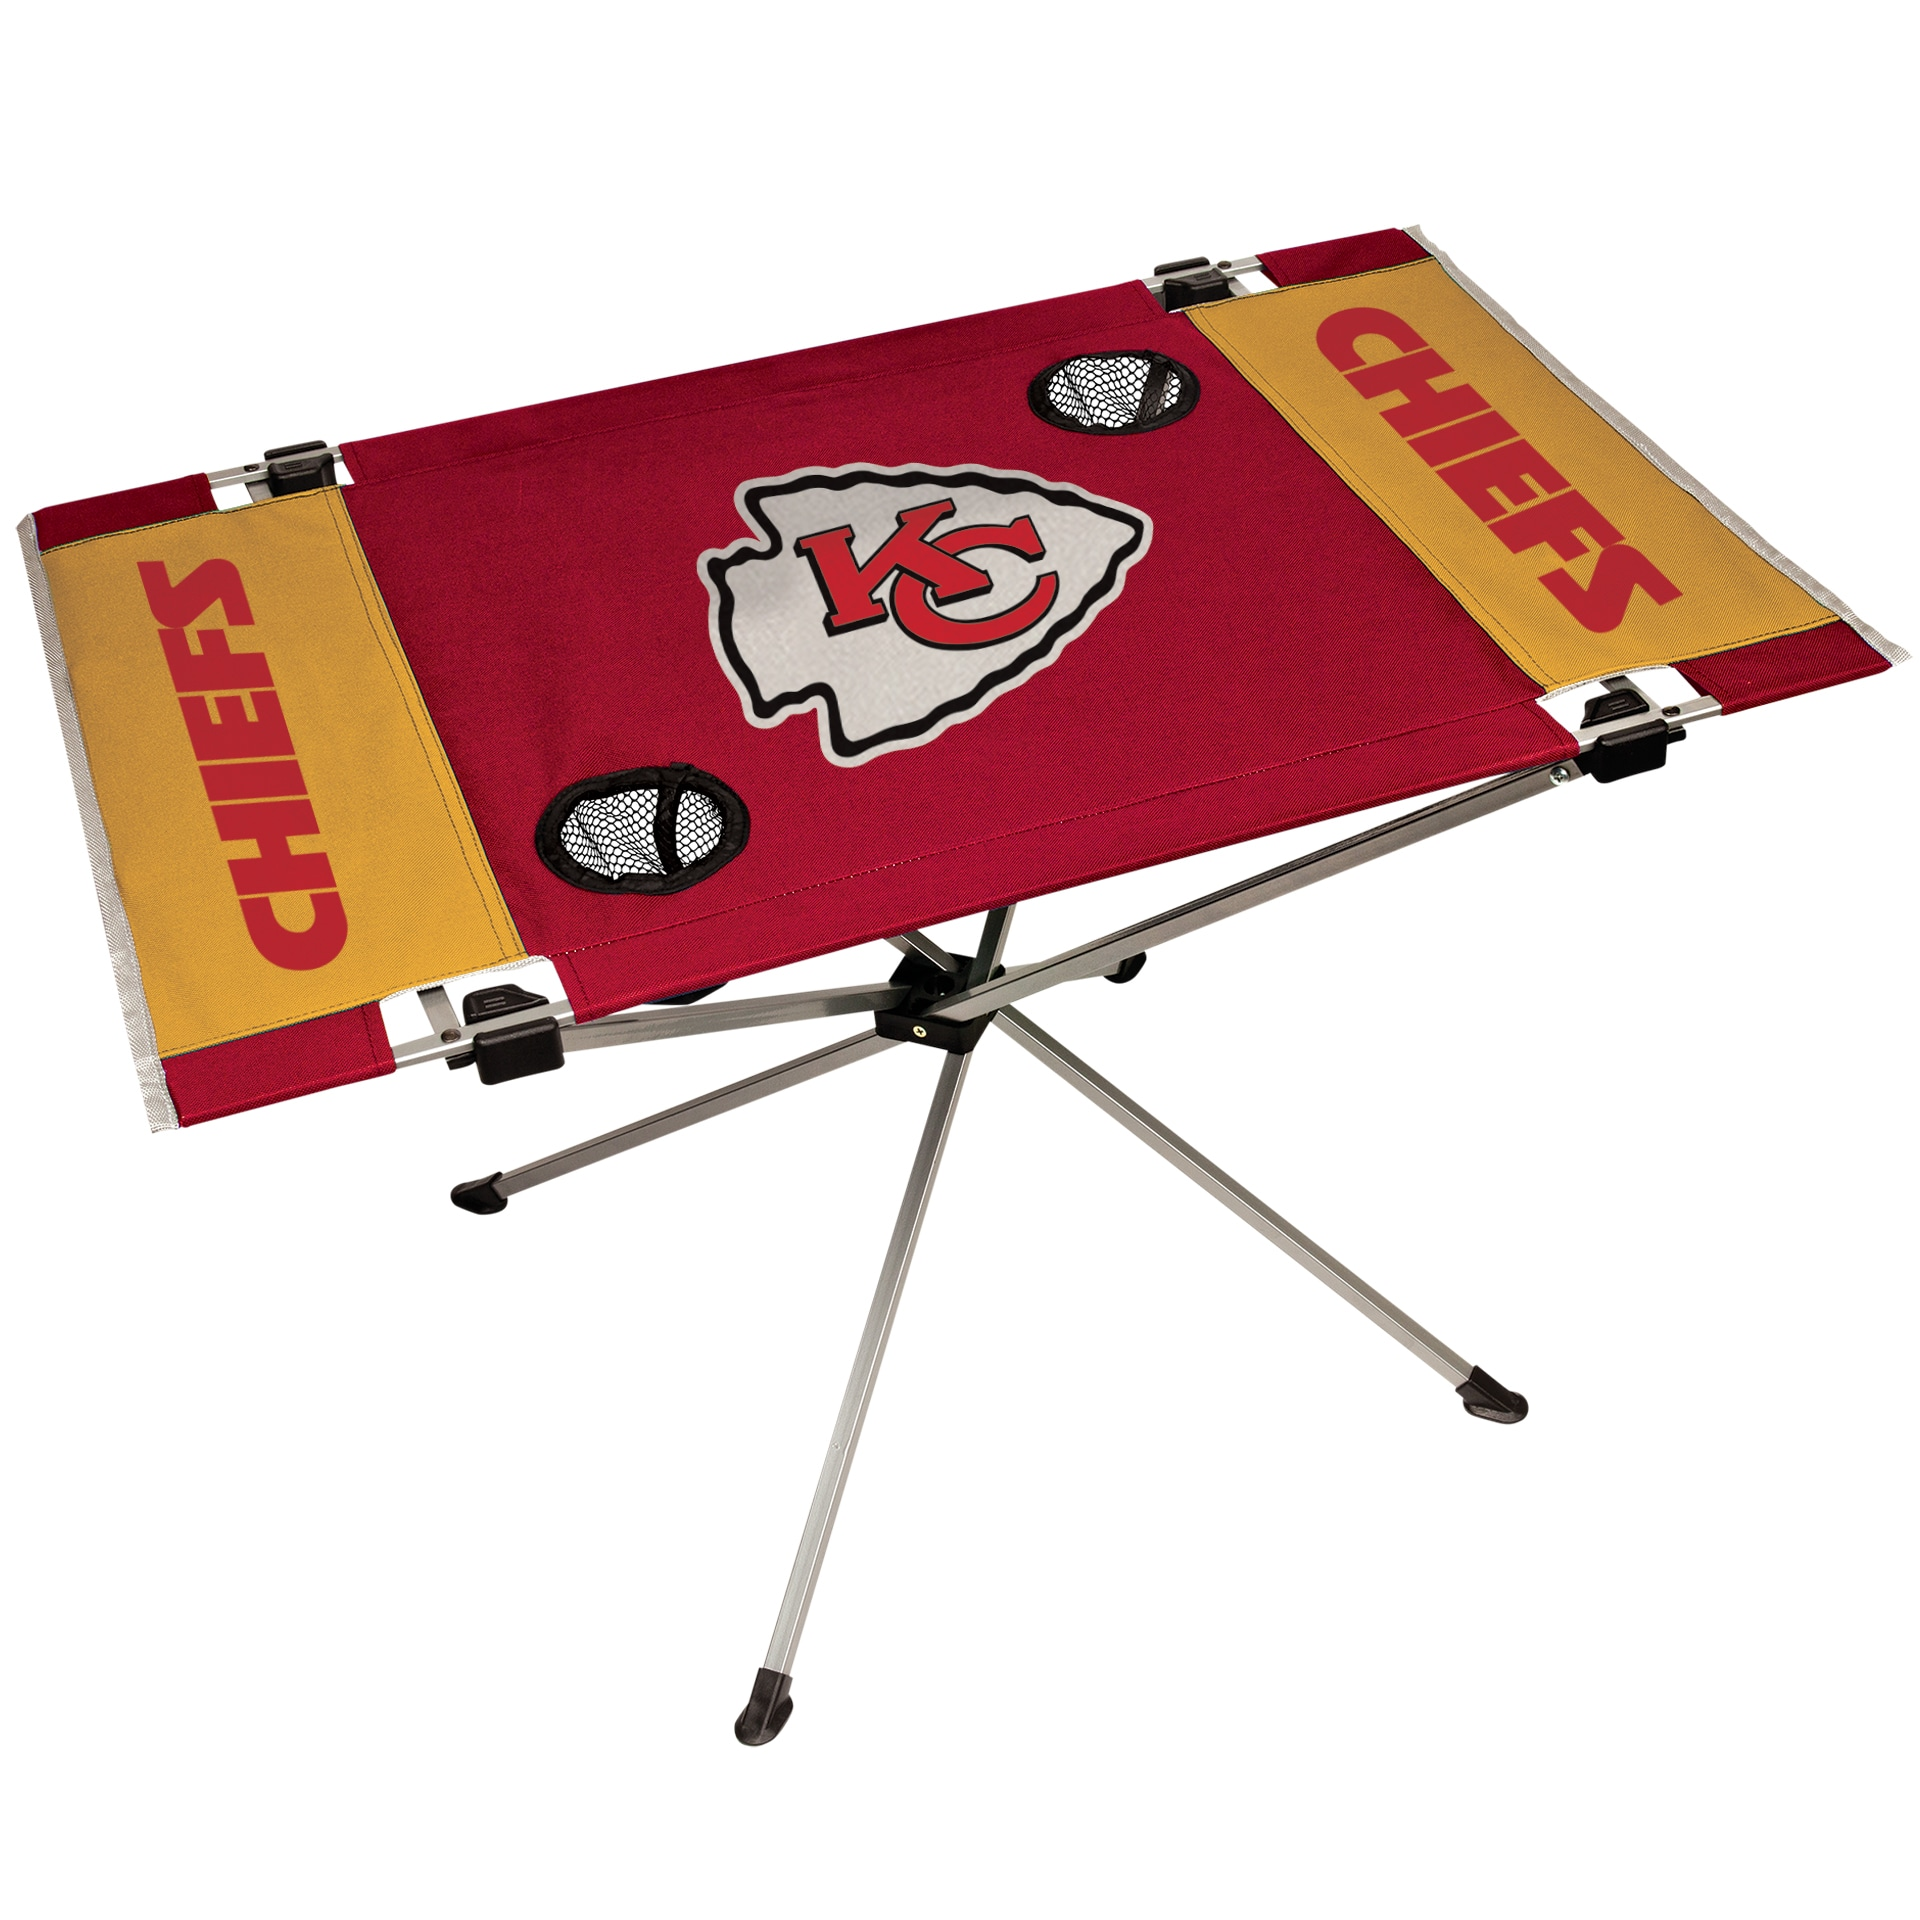 Kansas City Chiefs End Zone Table